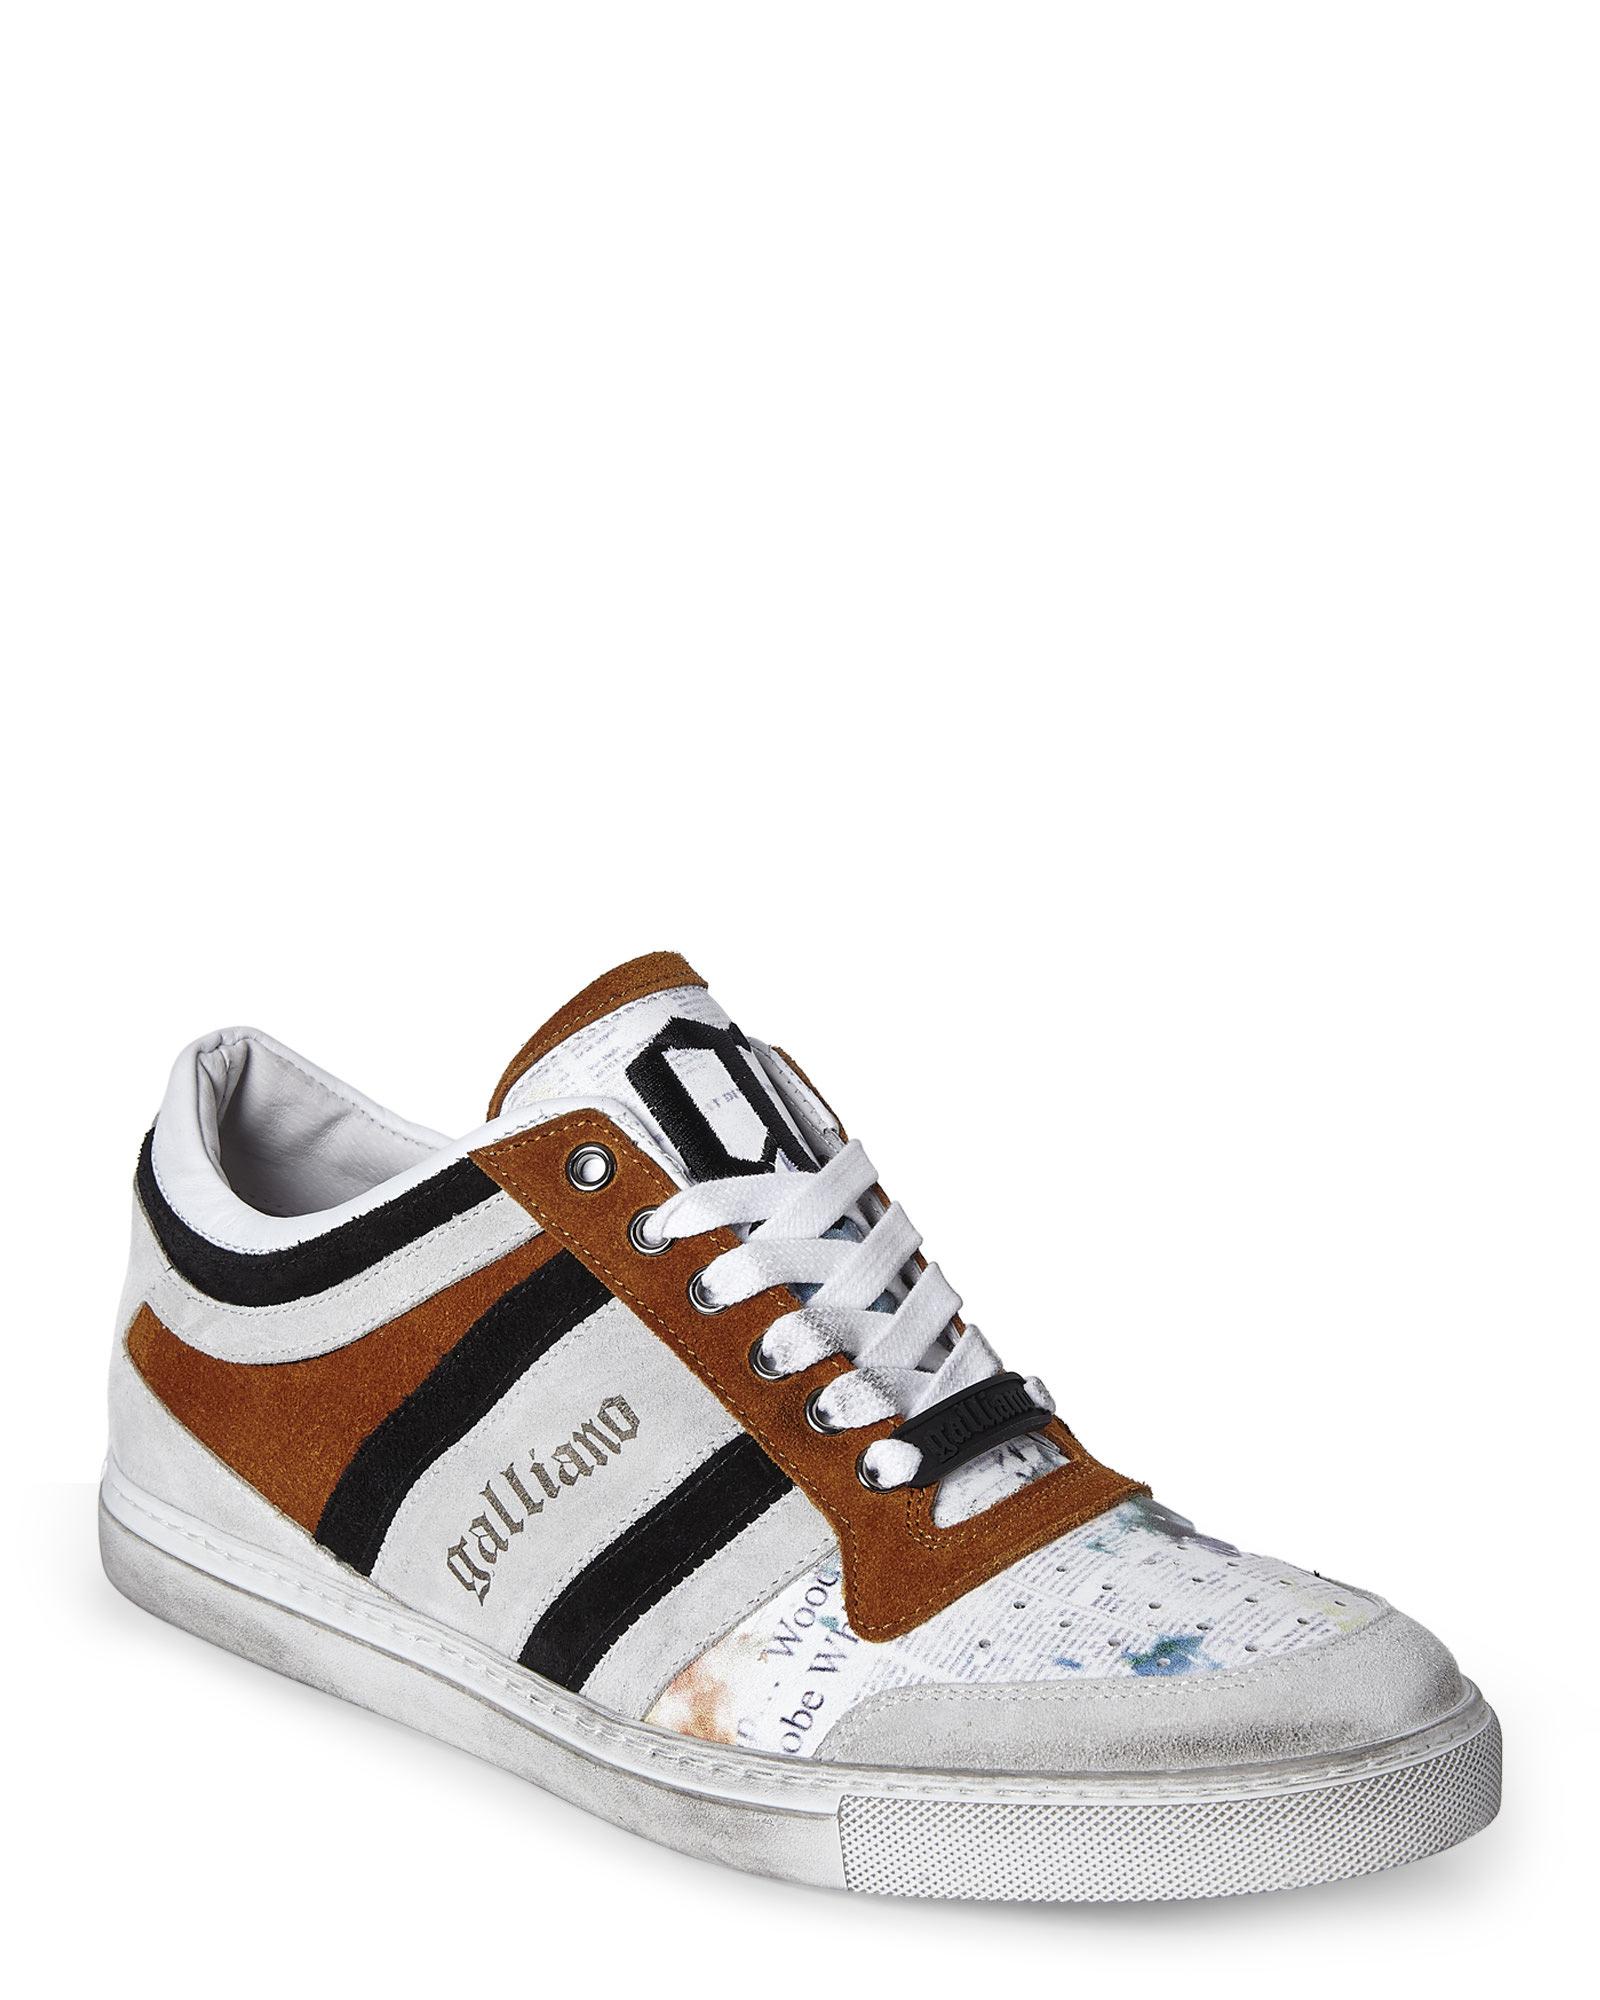 finest selection b370e 6cb32 john-galliano-light-grey-light-grey-broken-in-sneakers-gray-product-0-471713053-normal.jpeg